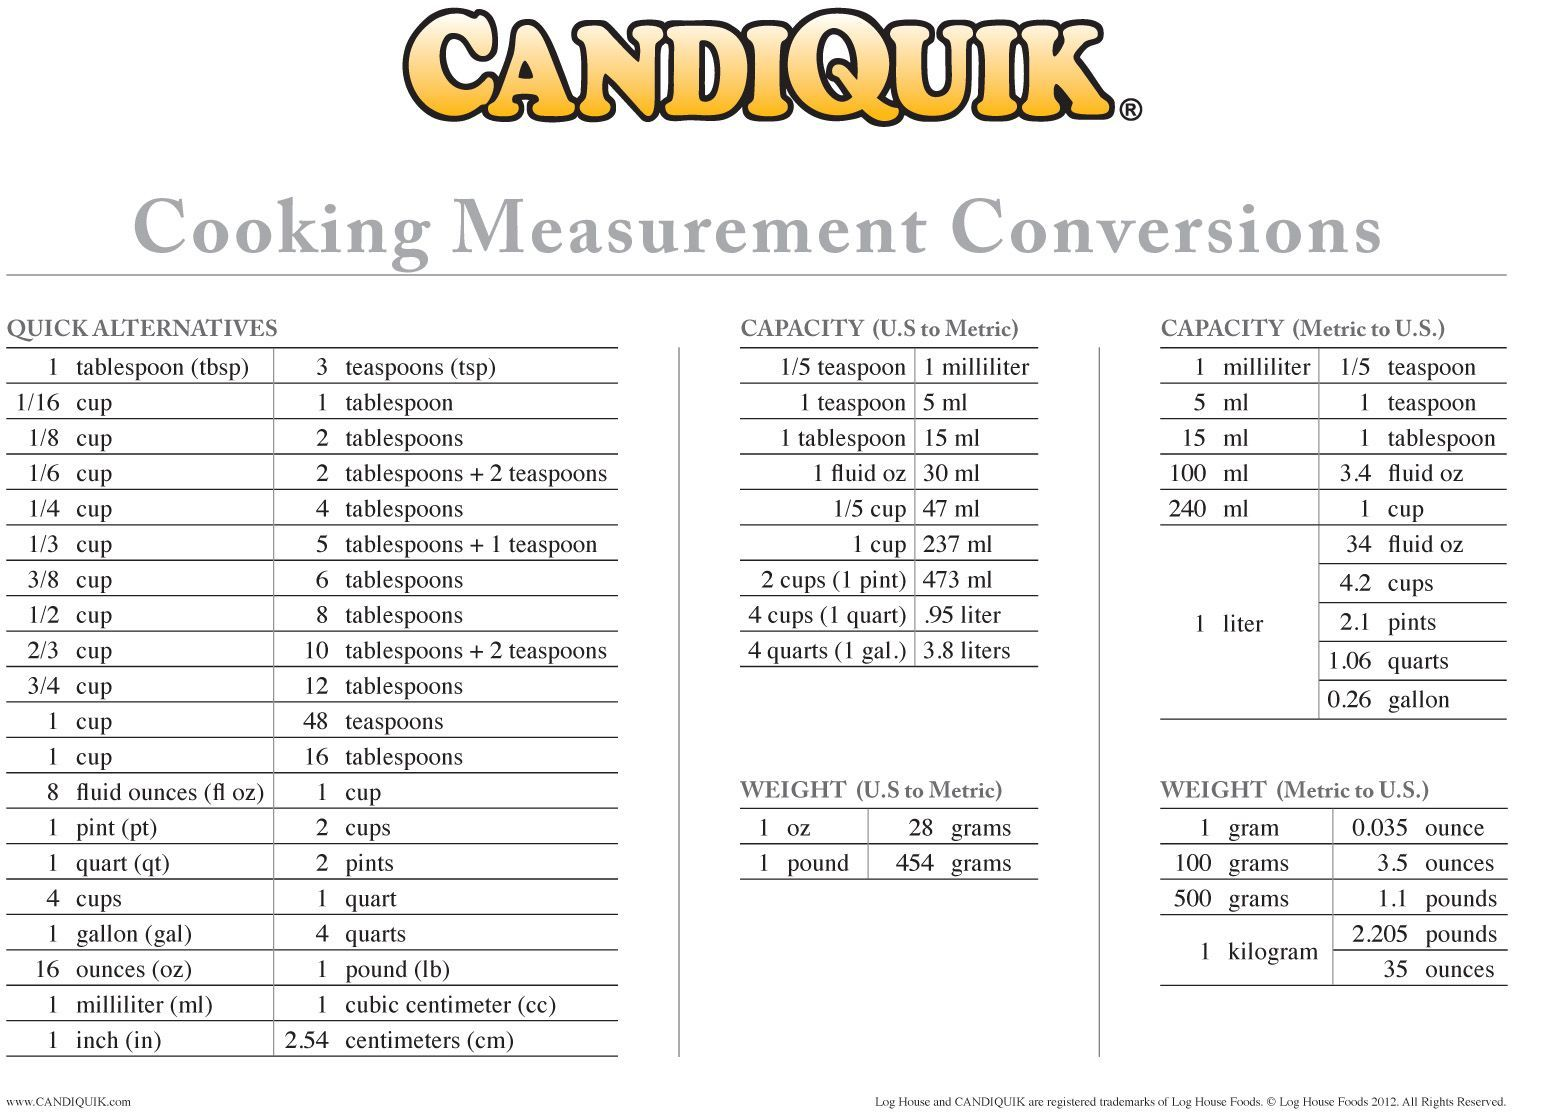 Teach Besides Me Abbreviation For Teaspoon In Recipe